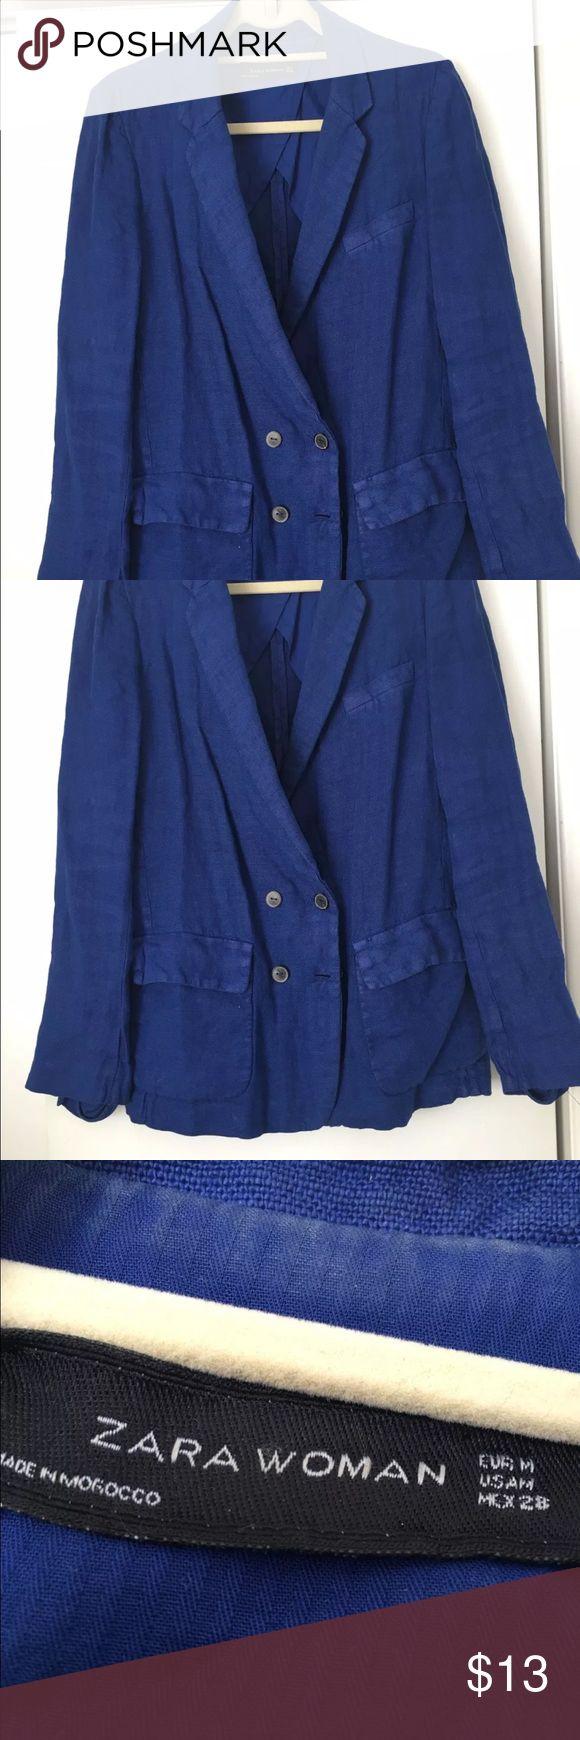 ZARA JACKET BLAZER BLUE LINEN & RAYON SIZE  M ZARA JACKET BLAZER BLUE LINEN & RAYON SIZE  M  needs to be steamed Zara Jackets & Coats Blazers